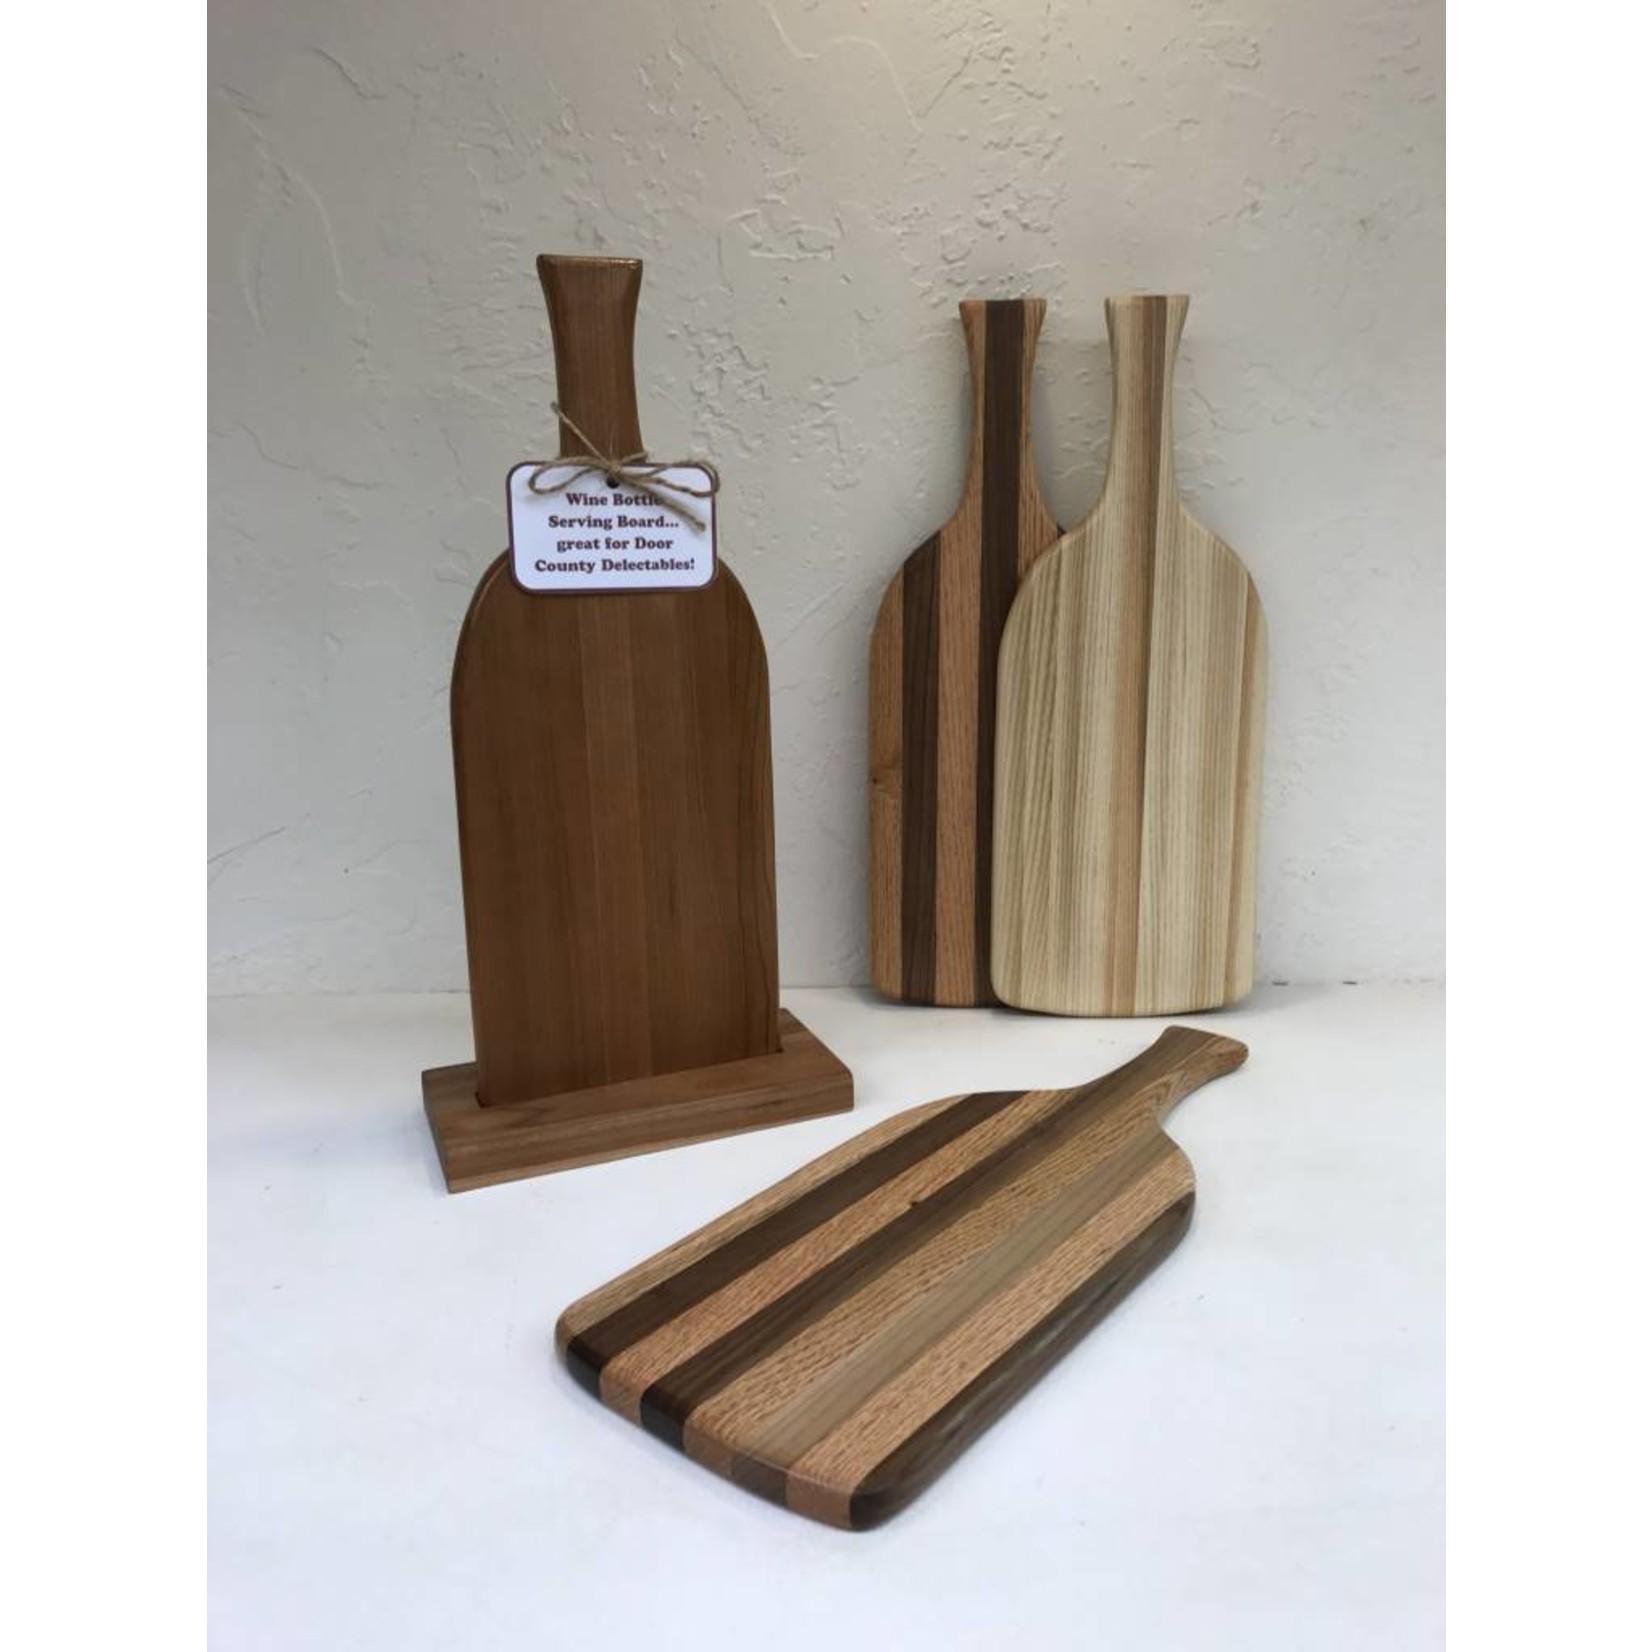 Richard Rose Culinary Wine Bottle Shaped Cutting Board